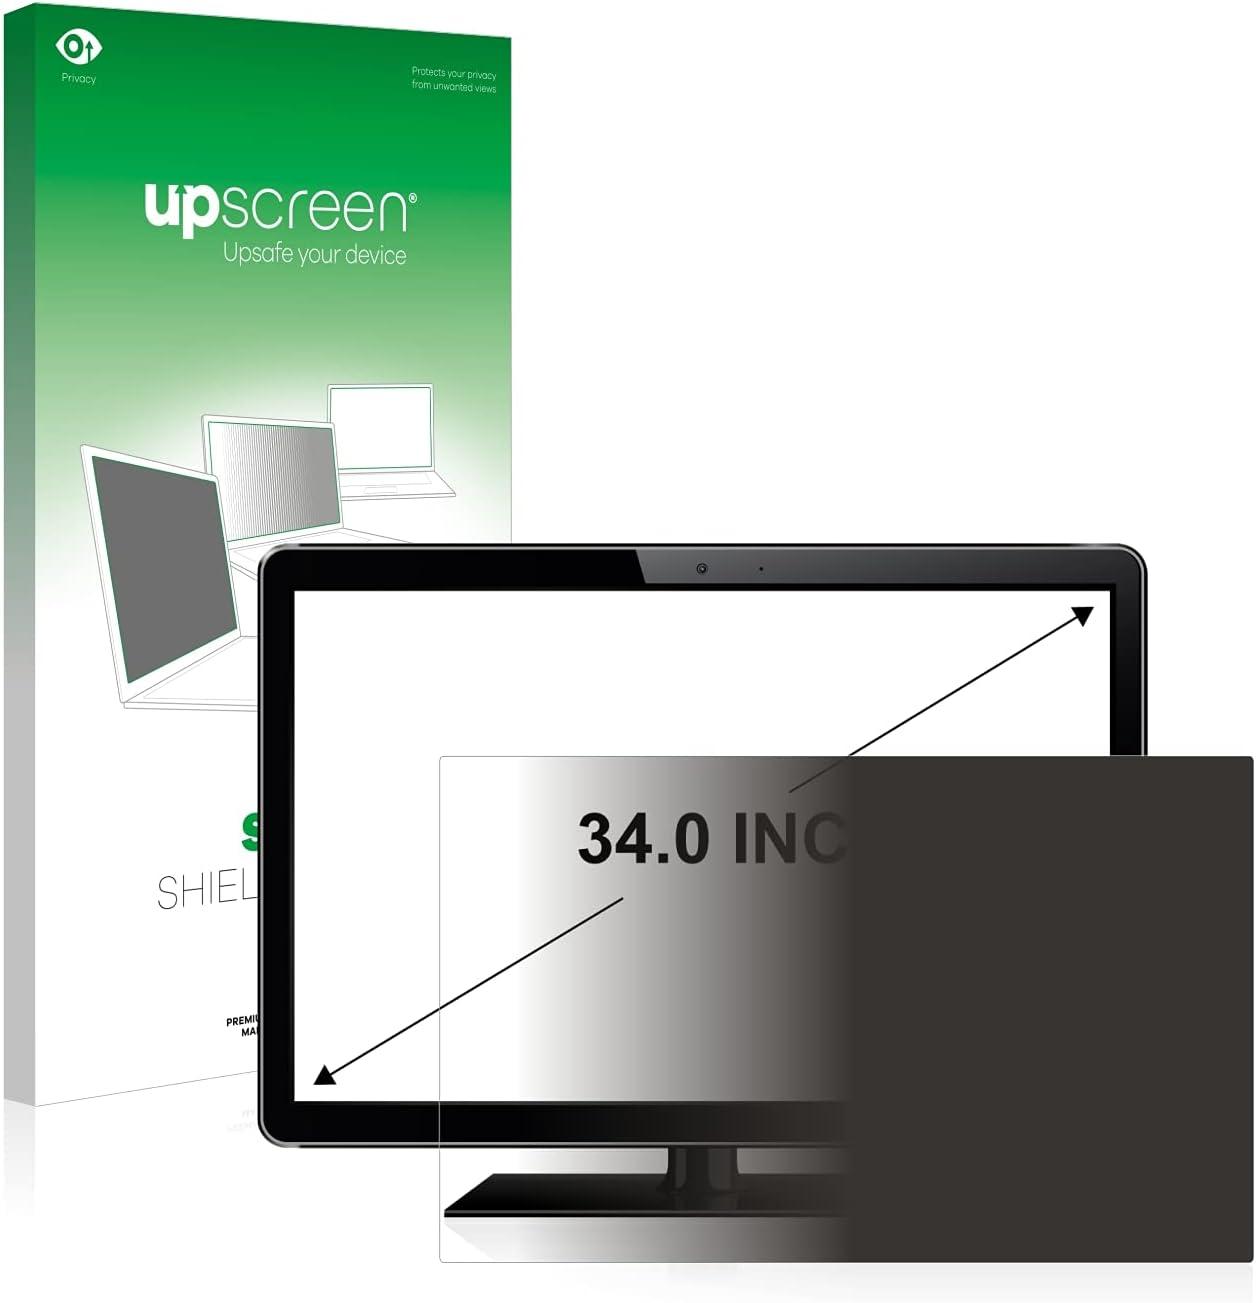 upscreen Blickschutzfilter kompatibel mit Dell U3419W Privacy Filter Anti-Spy Blickschutzfolie Sichtschutz-Folie